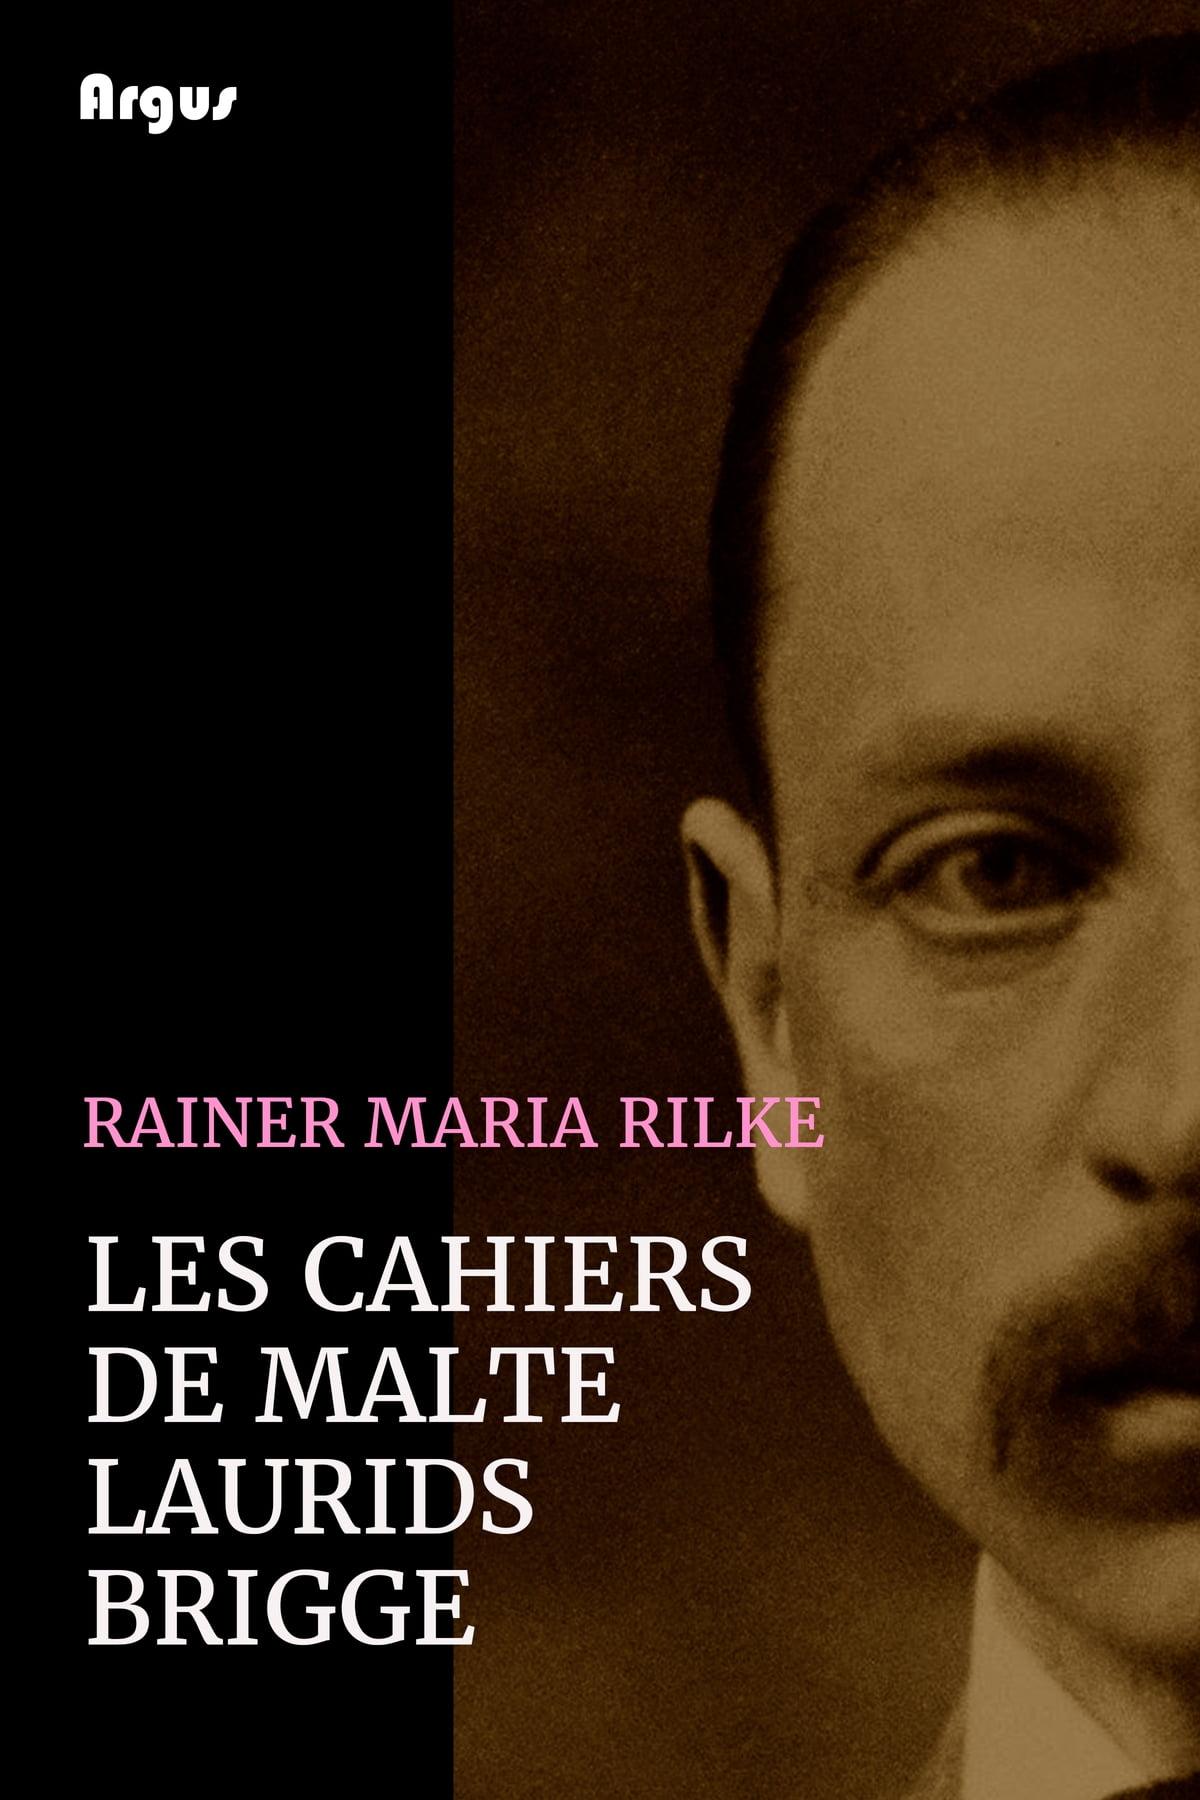 Les Cahiers De Malte Laurids Brigge : cahiers, malte, laurids, brigge, Cahiers, Malte, Laurids, Brigge, EBook, Rainer, Maria, Rilke, 1230003098820, Rakuten, United, States